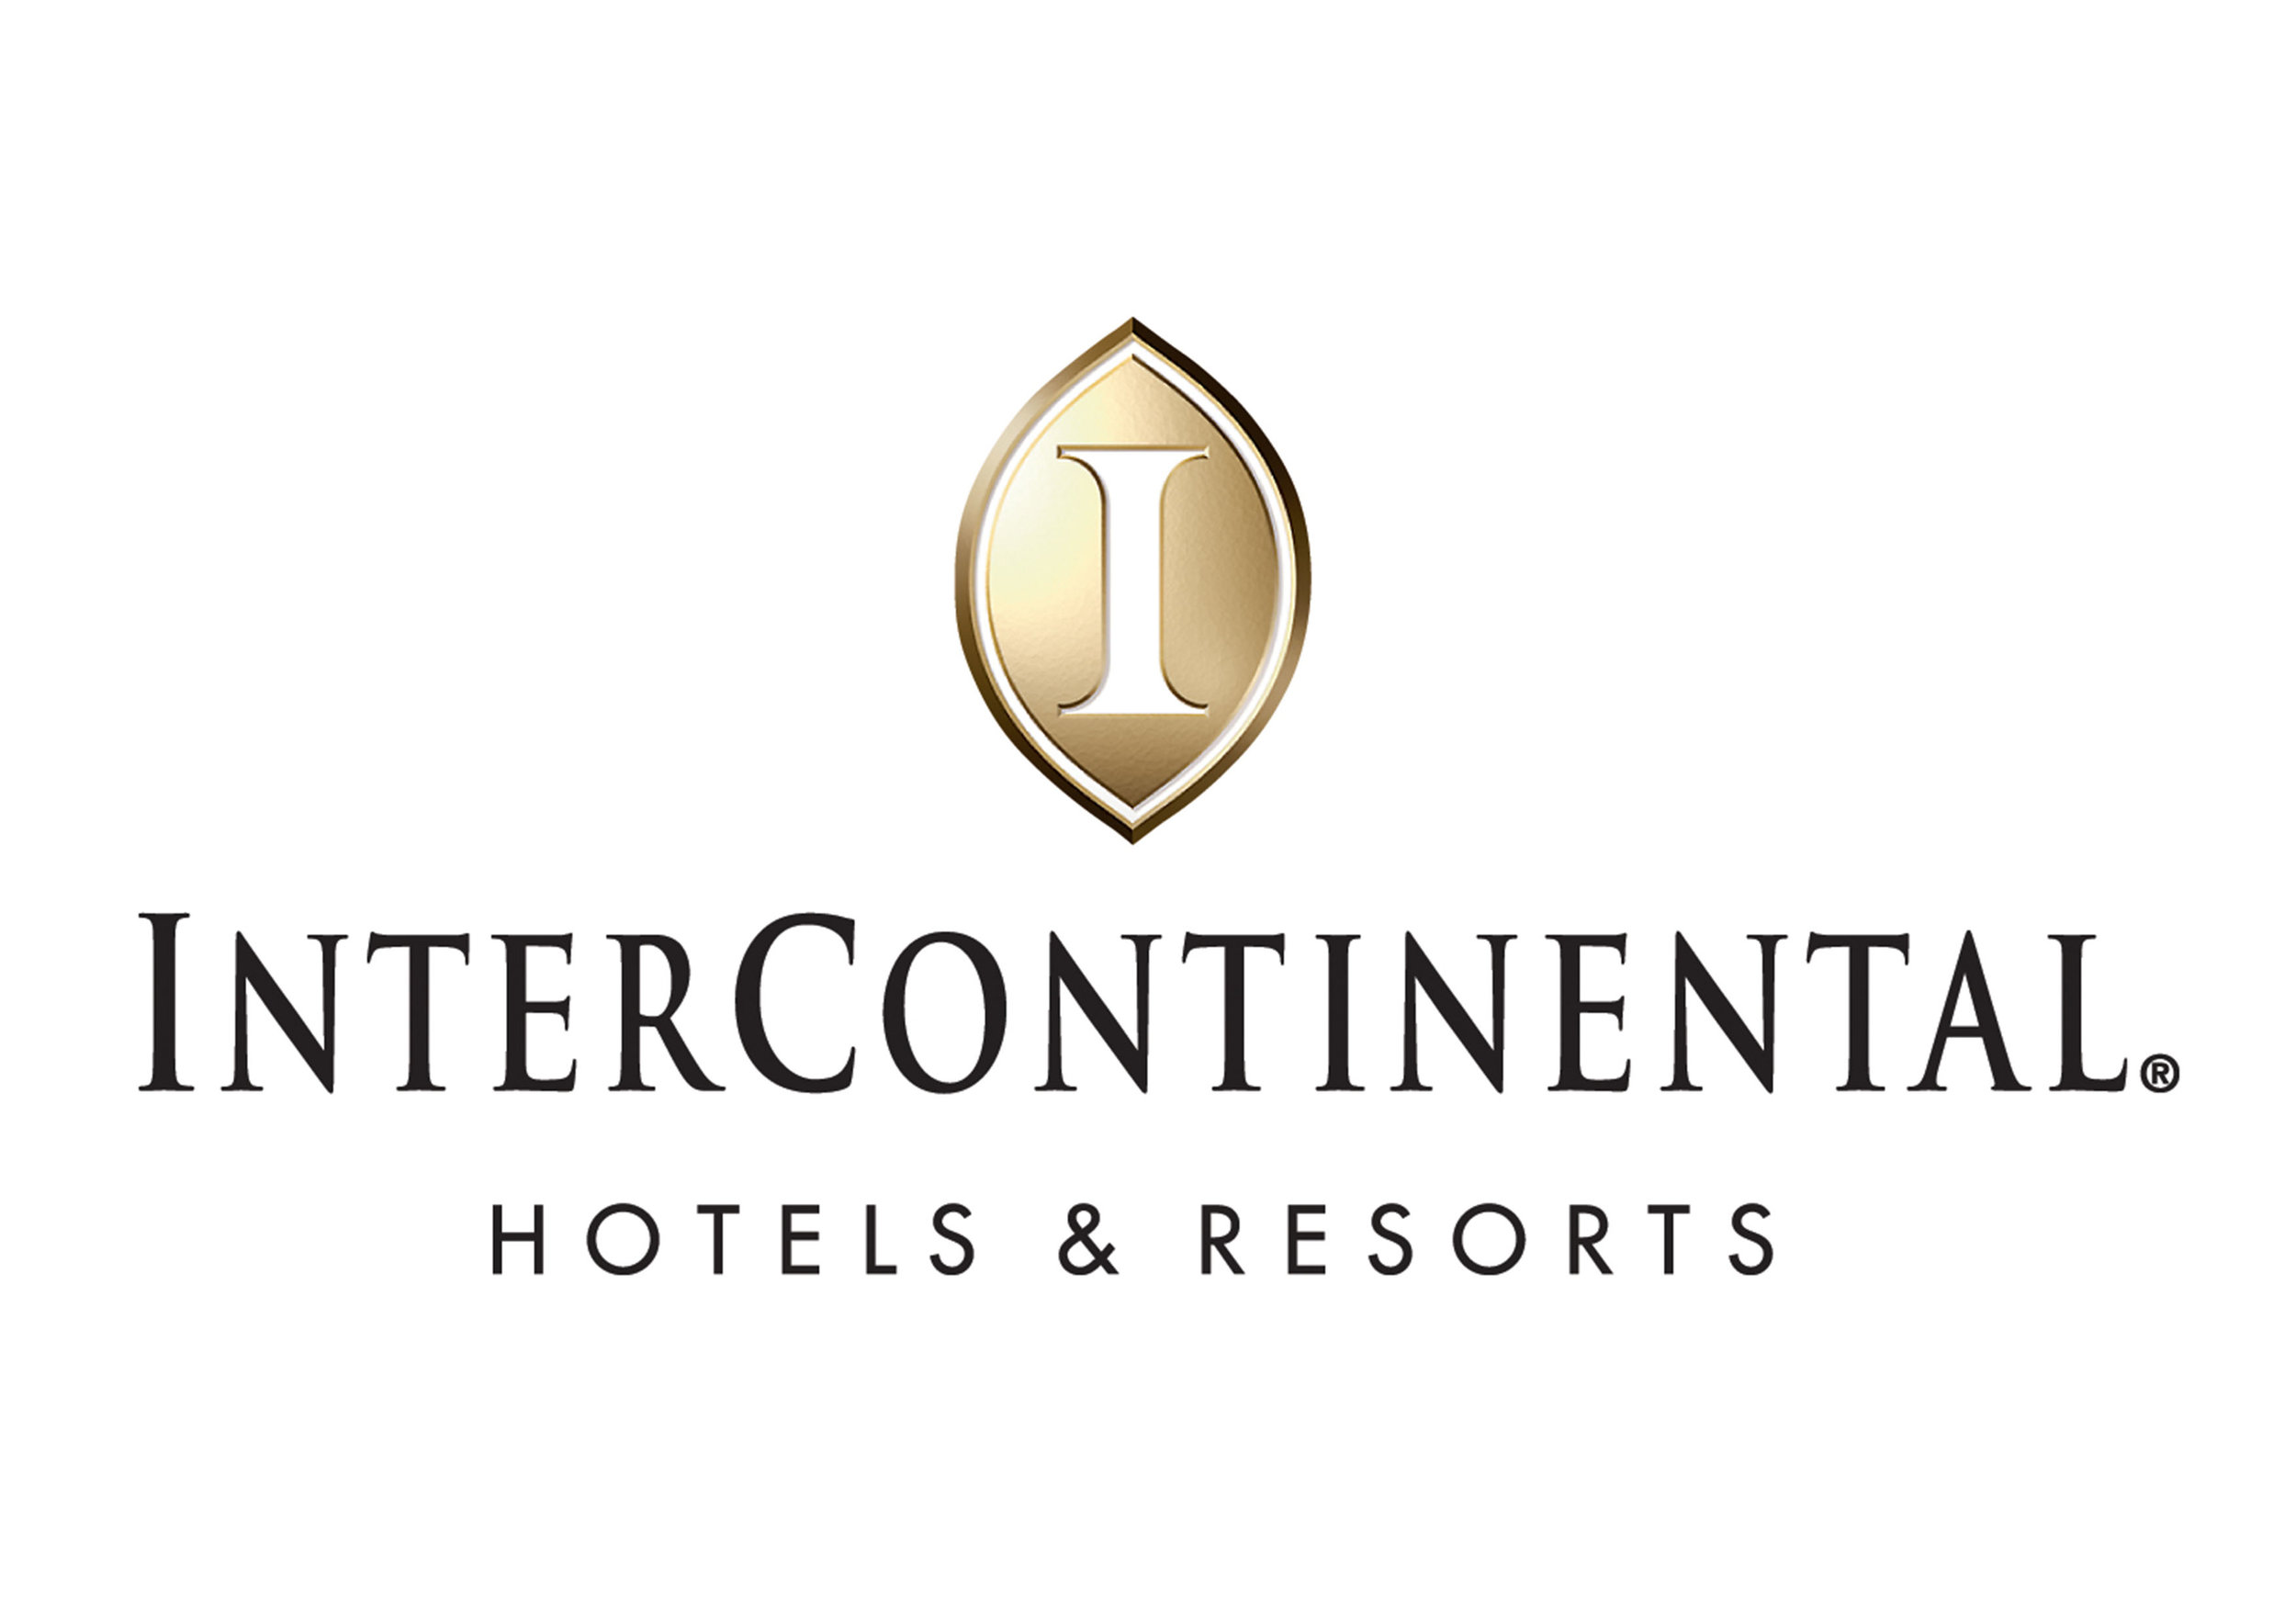 ..  Intercontinental Hotels & Resorts